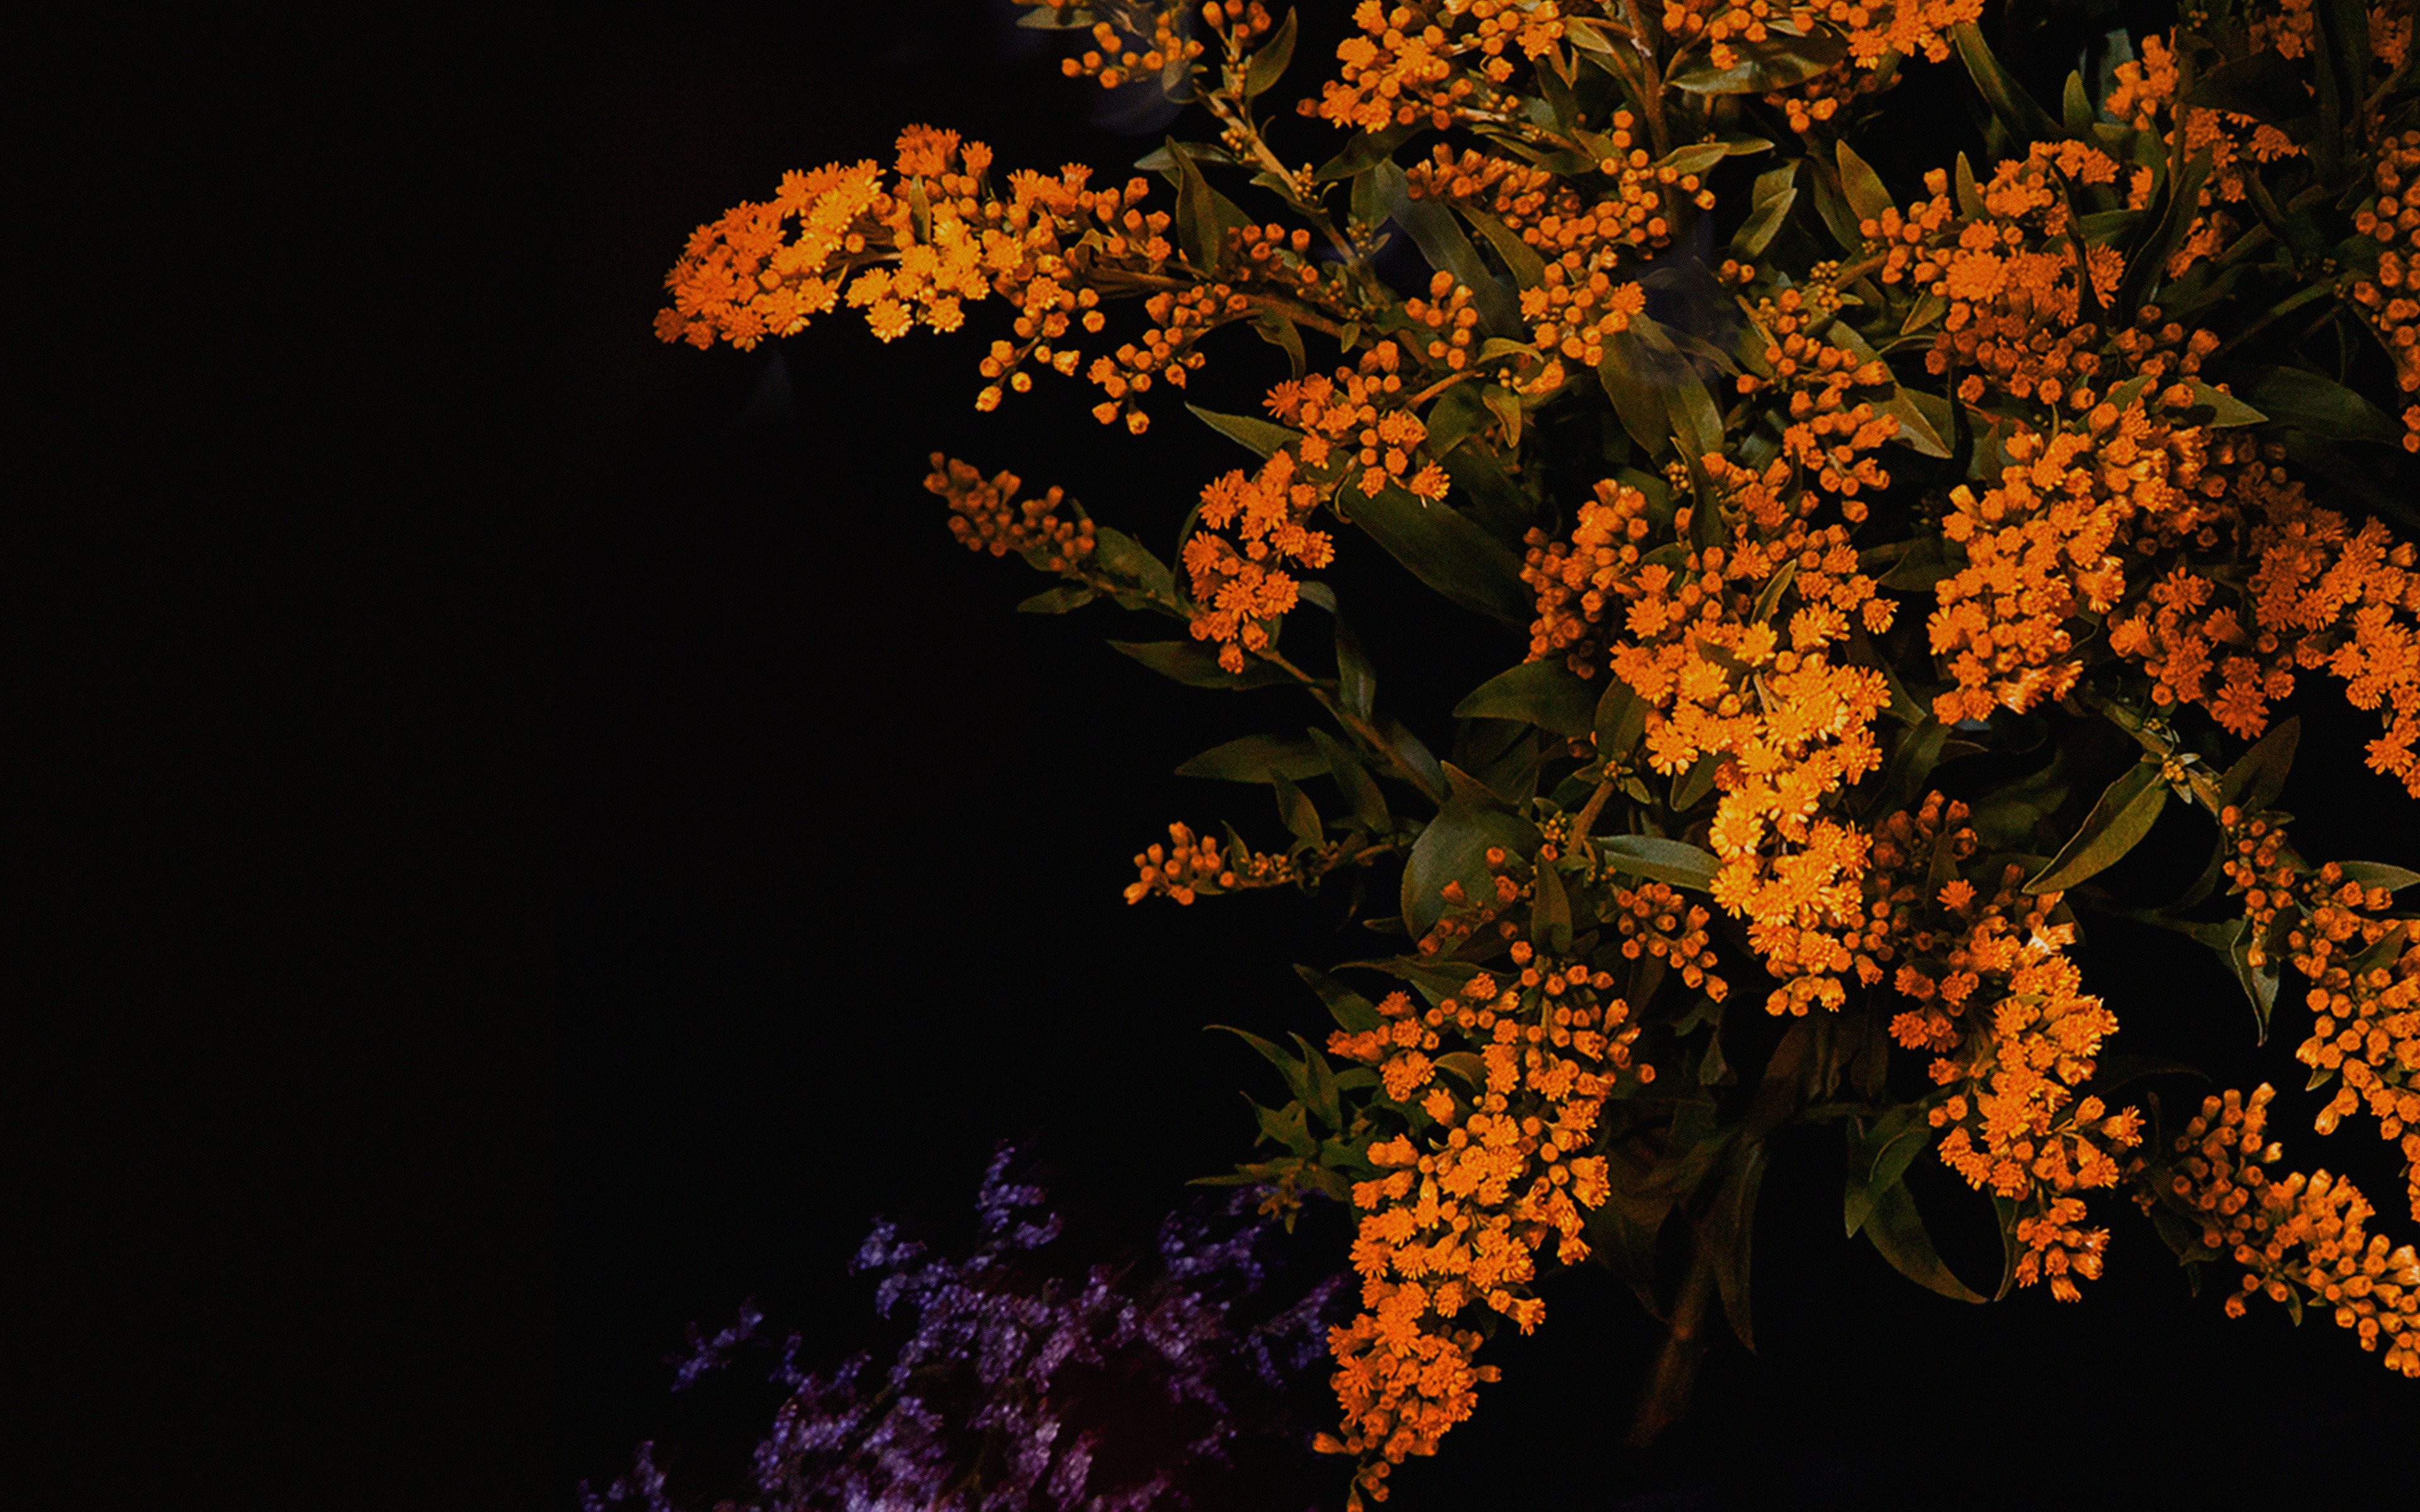 An58 Apple Orange Flower Dark Ios9 Iphone6s Papersco